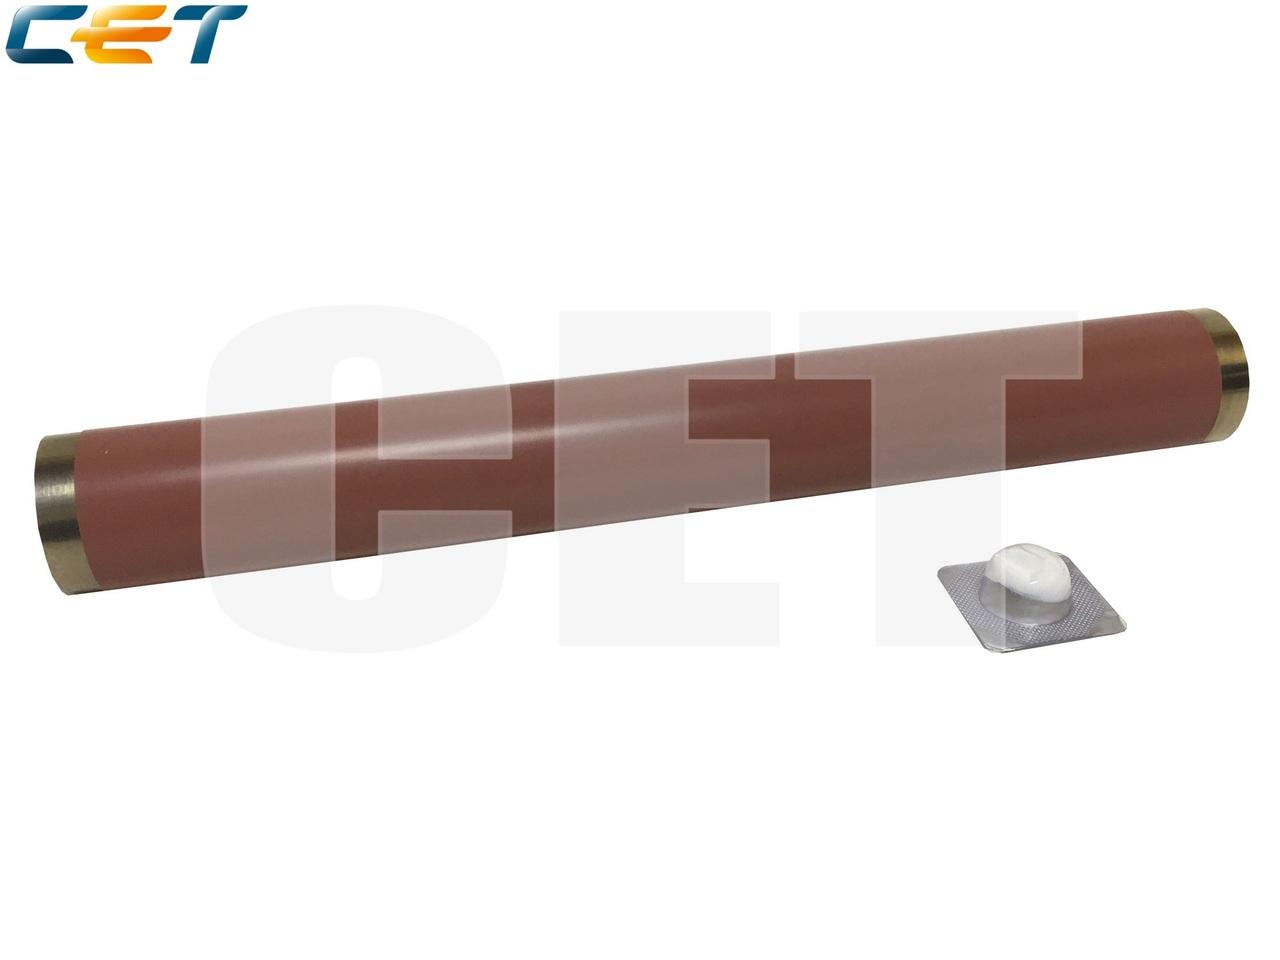 Термопленка для HP LaserJetP4014/P4015dn/P4515n/Enterprise 600 M601dn/M602dn/M603dn(CET), CET2445